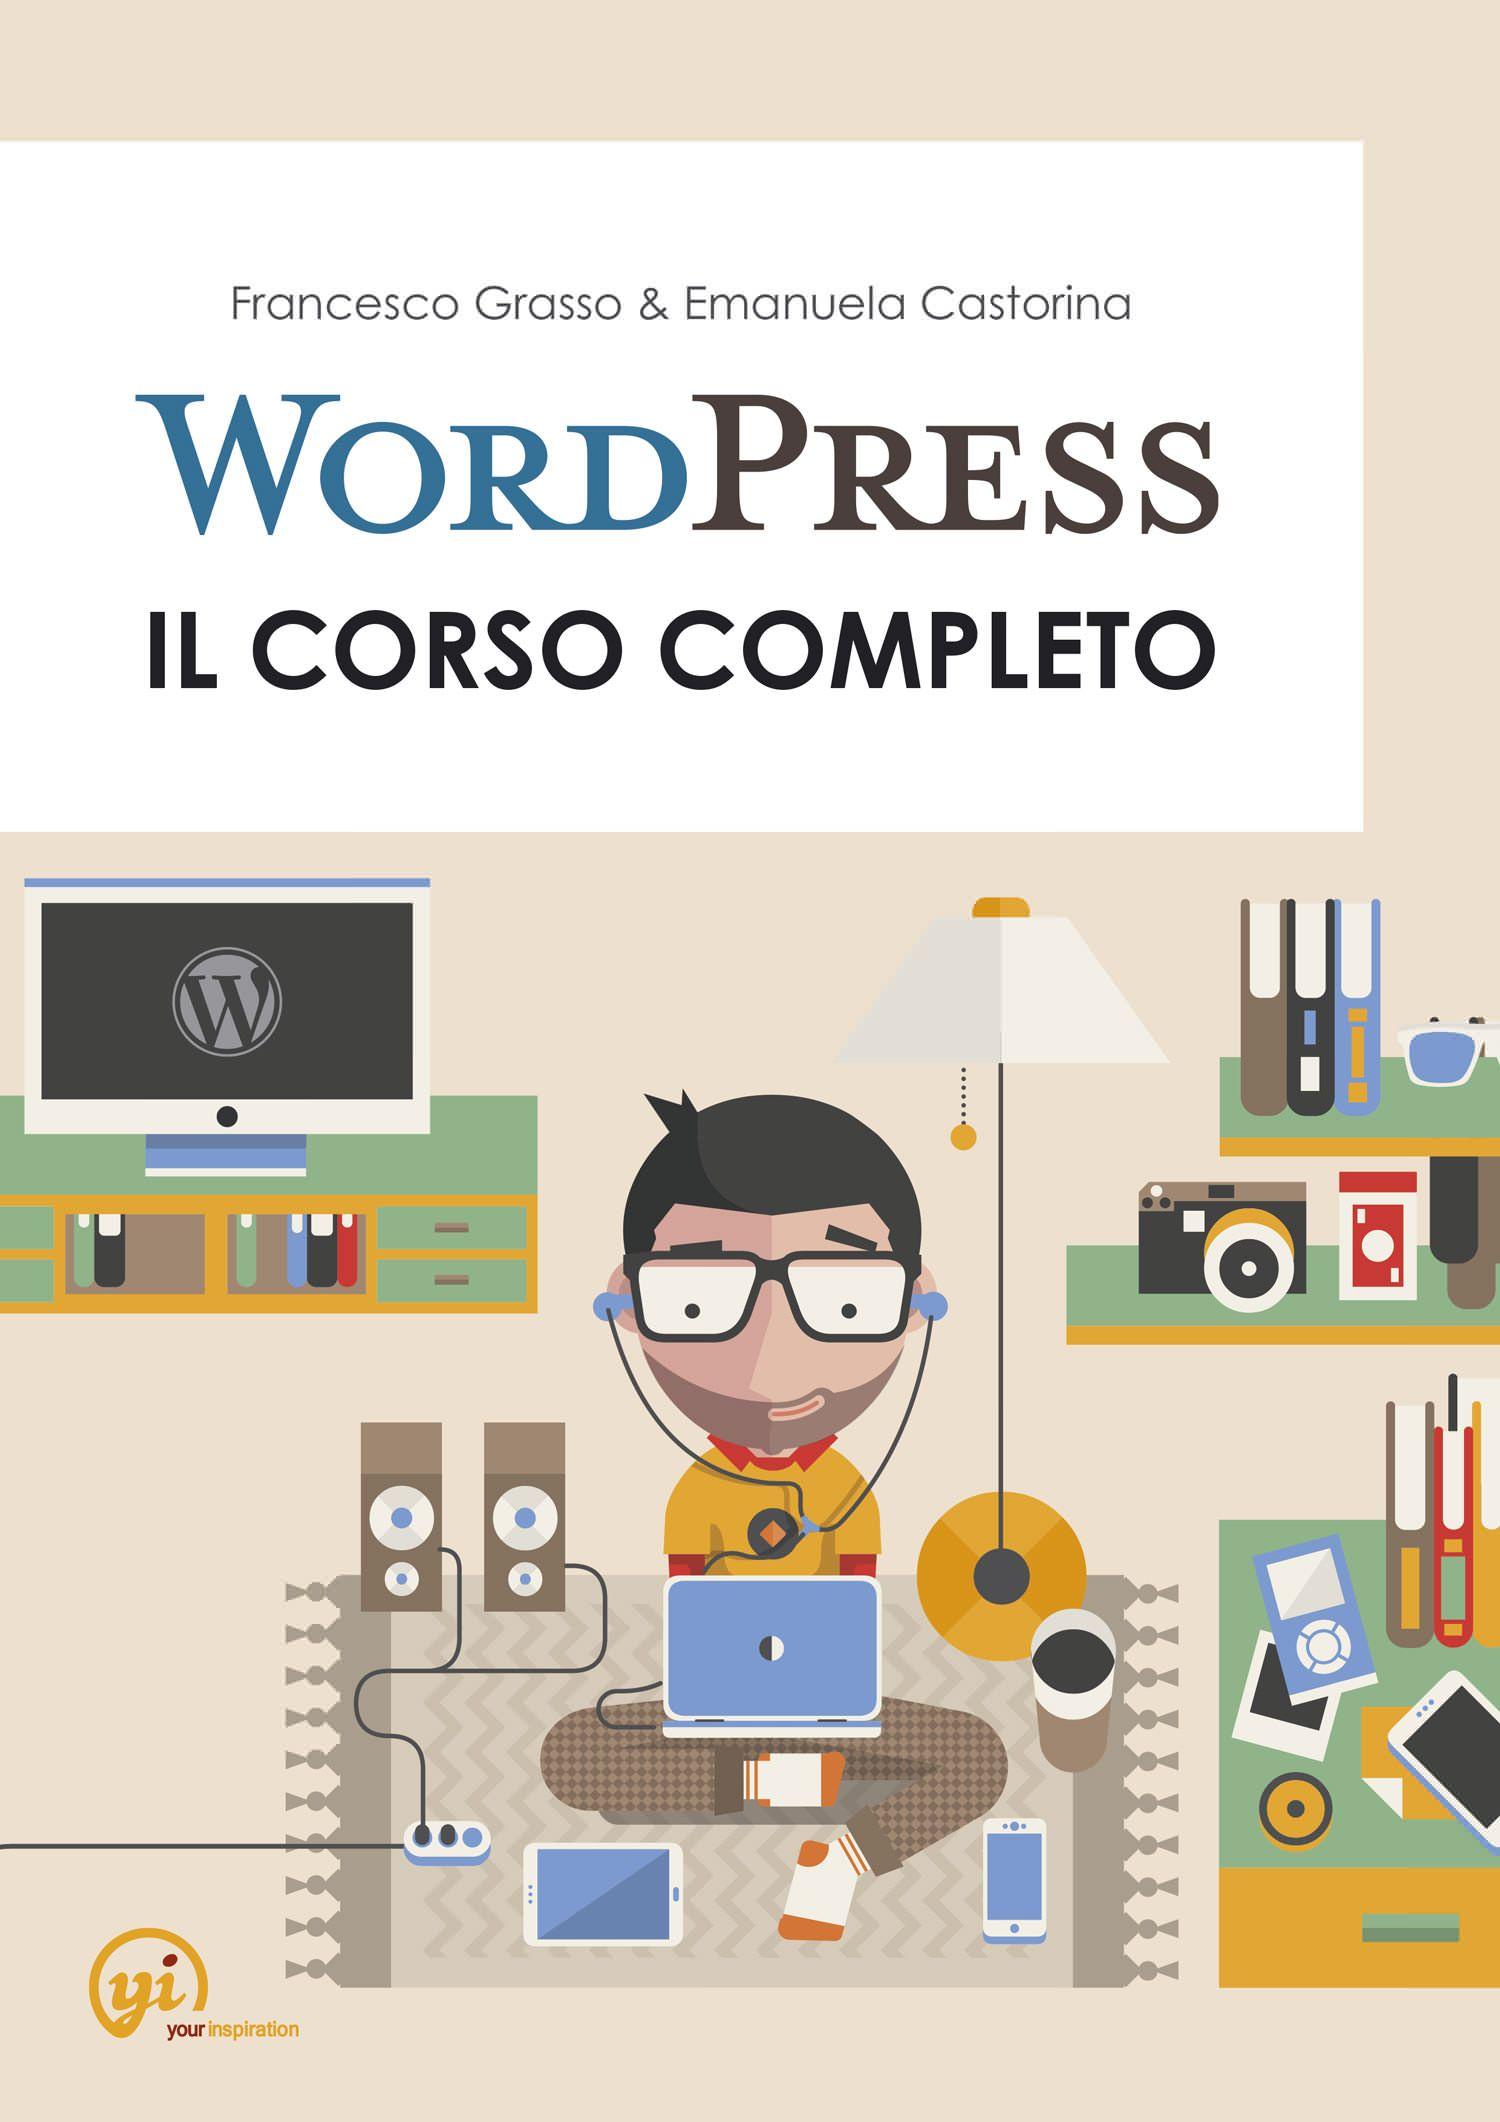 Corso WordPress completo Wordpress, Tema, Libri